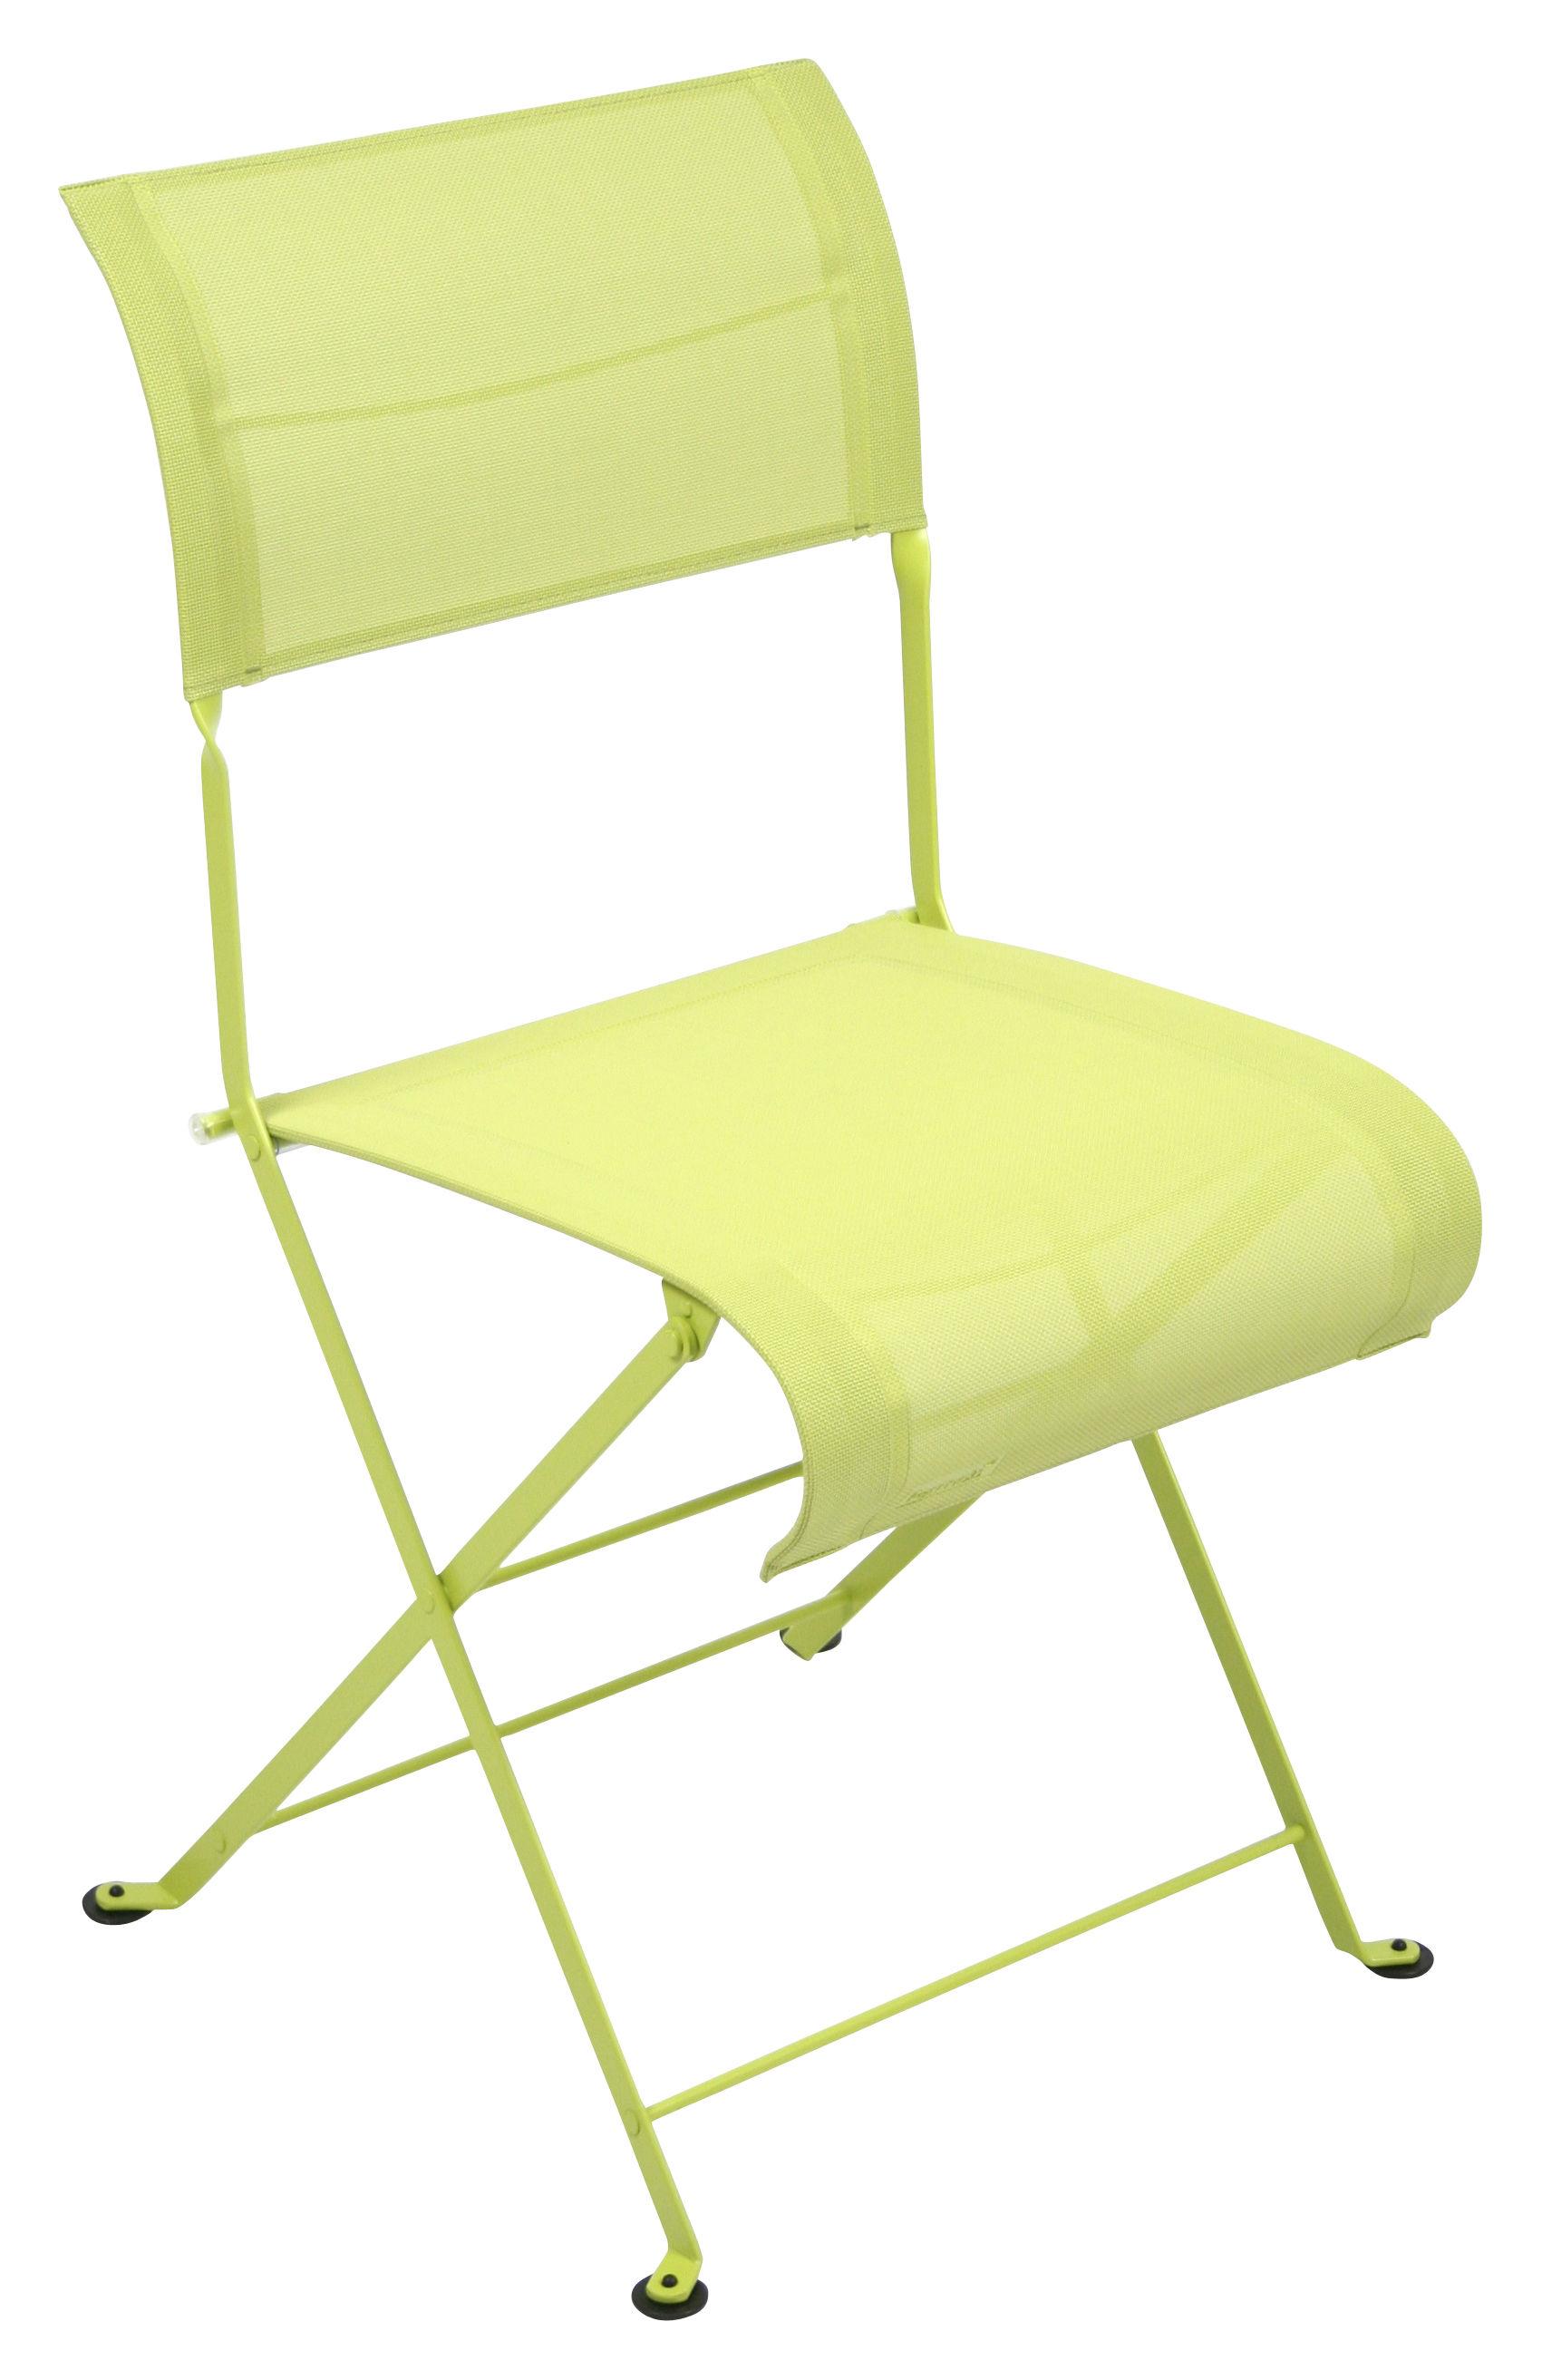 chaise pliante dune toile verveine fermob. Black Bedroom Furniture Sets. Home Design Ideas